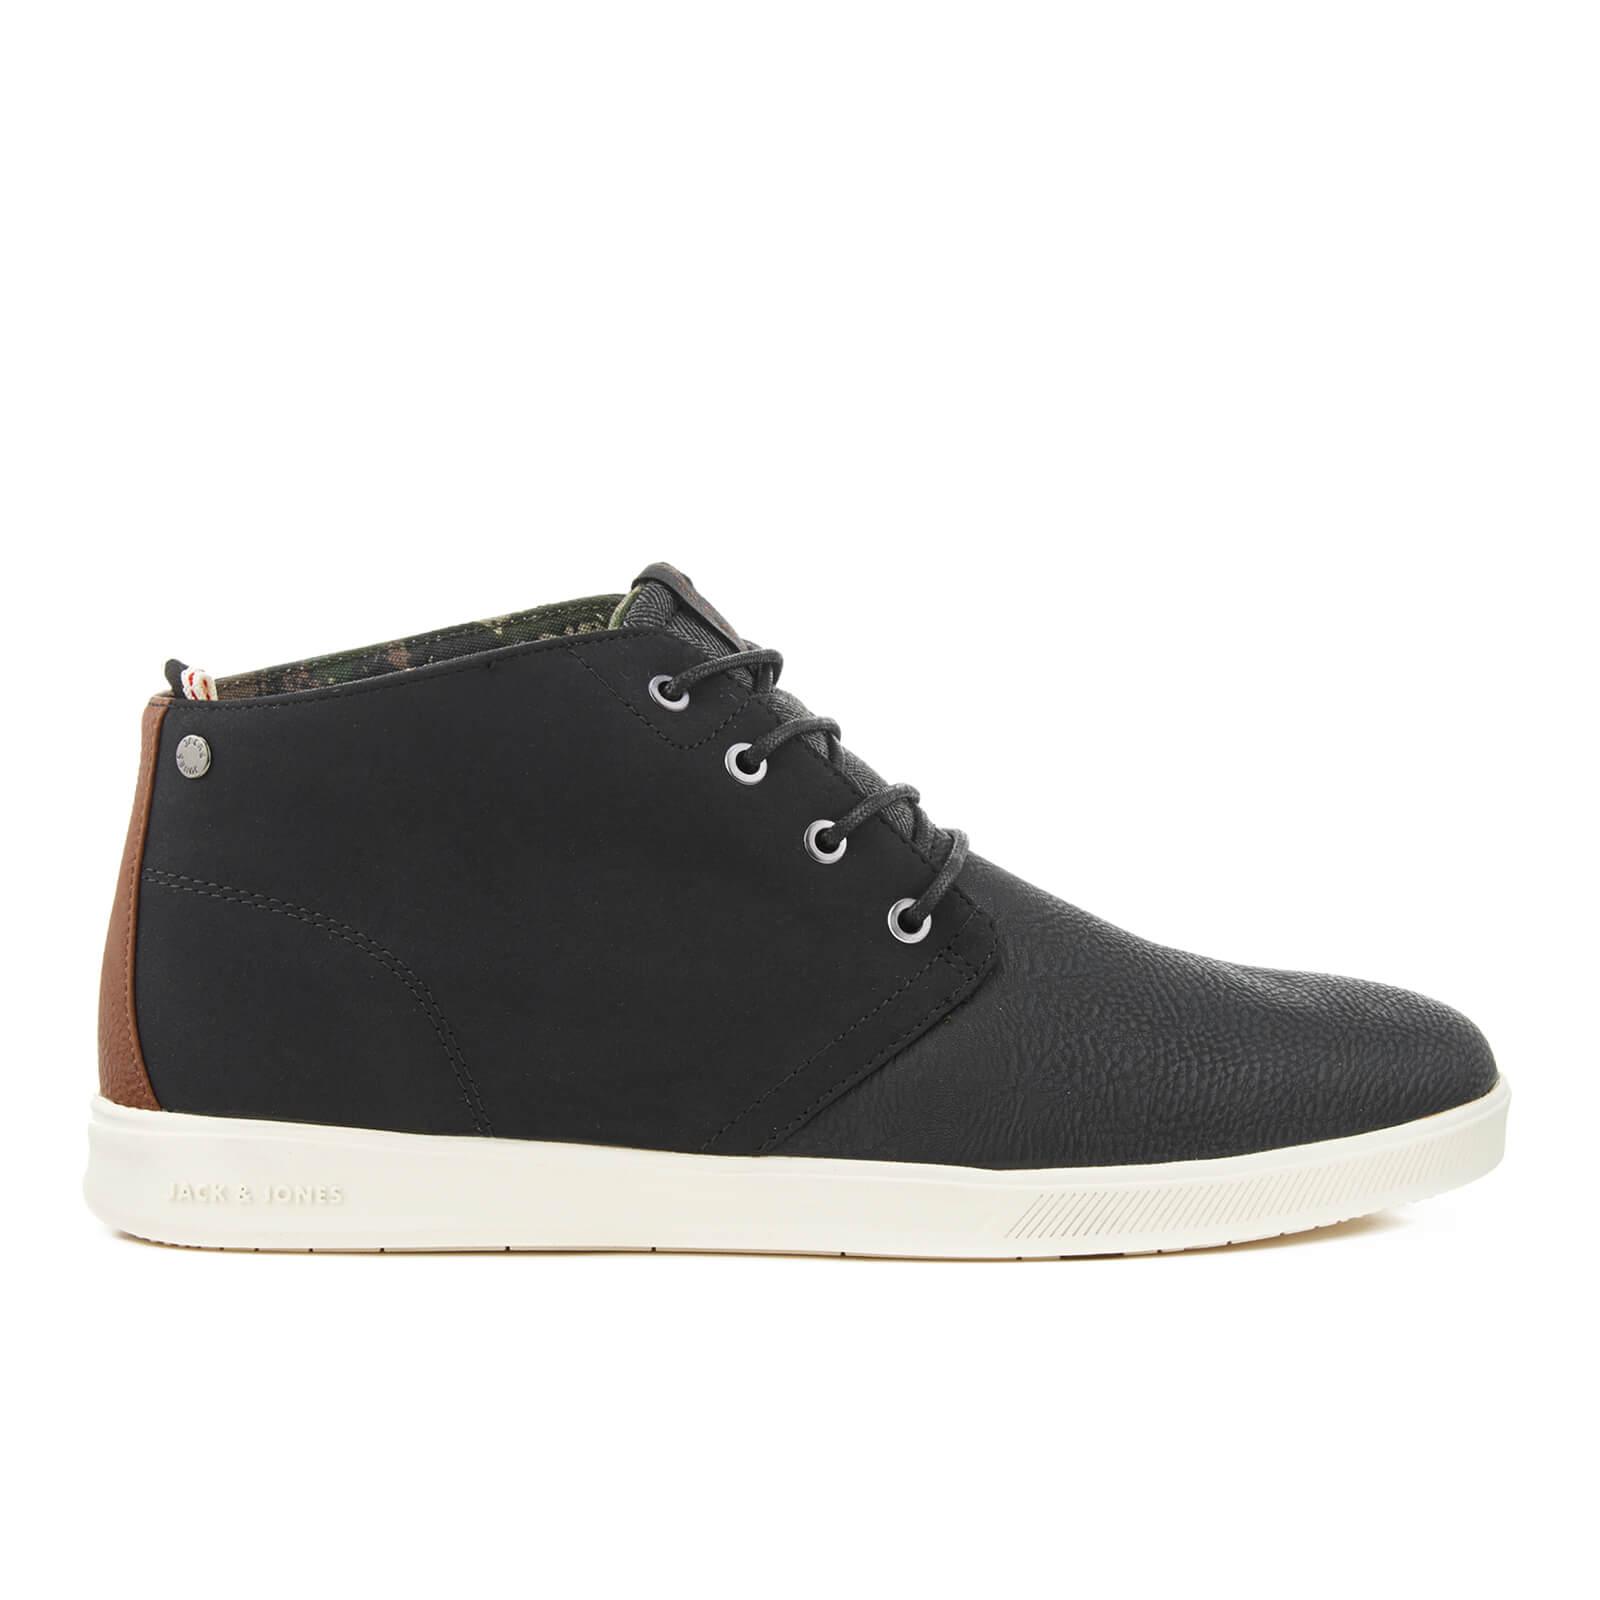 8f8158be5ac2 Jack   Jones Men s Denton PU Mix Shoes - Anthracite Clothing